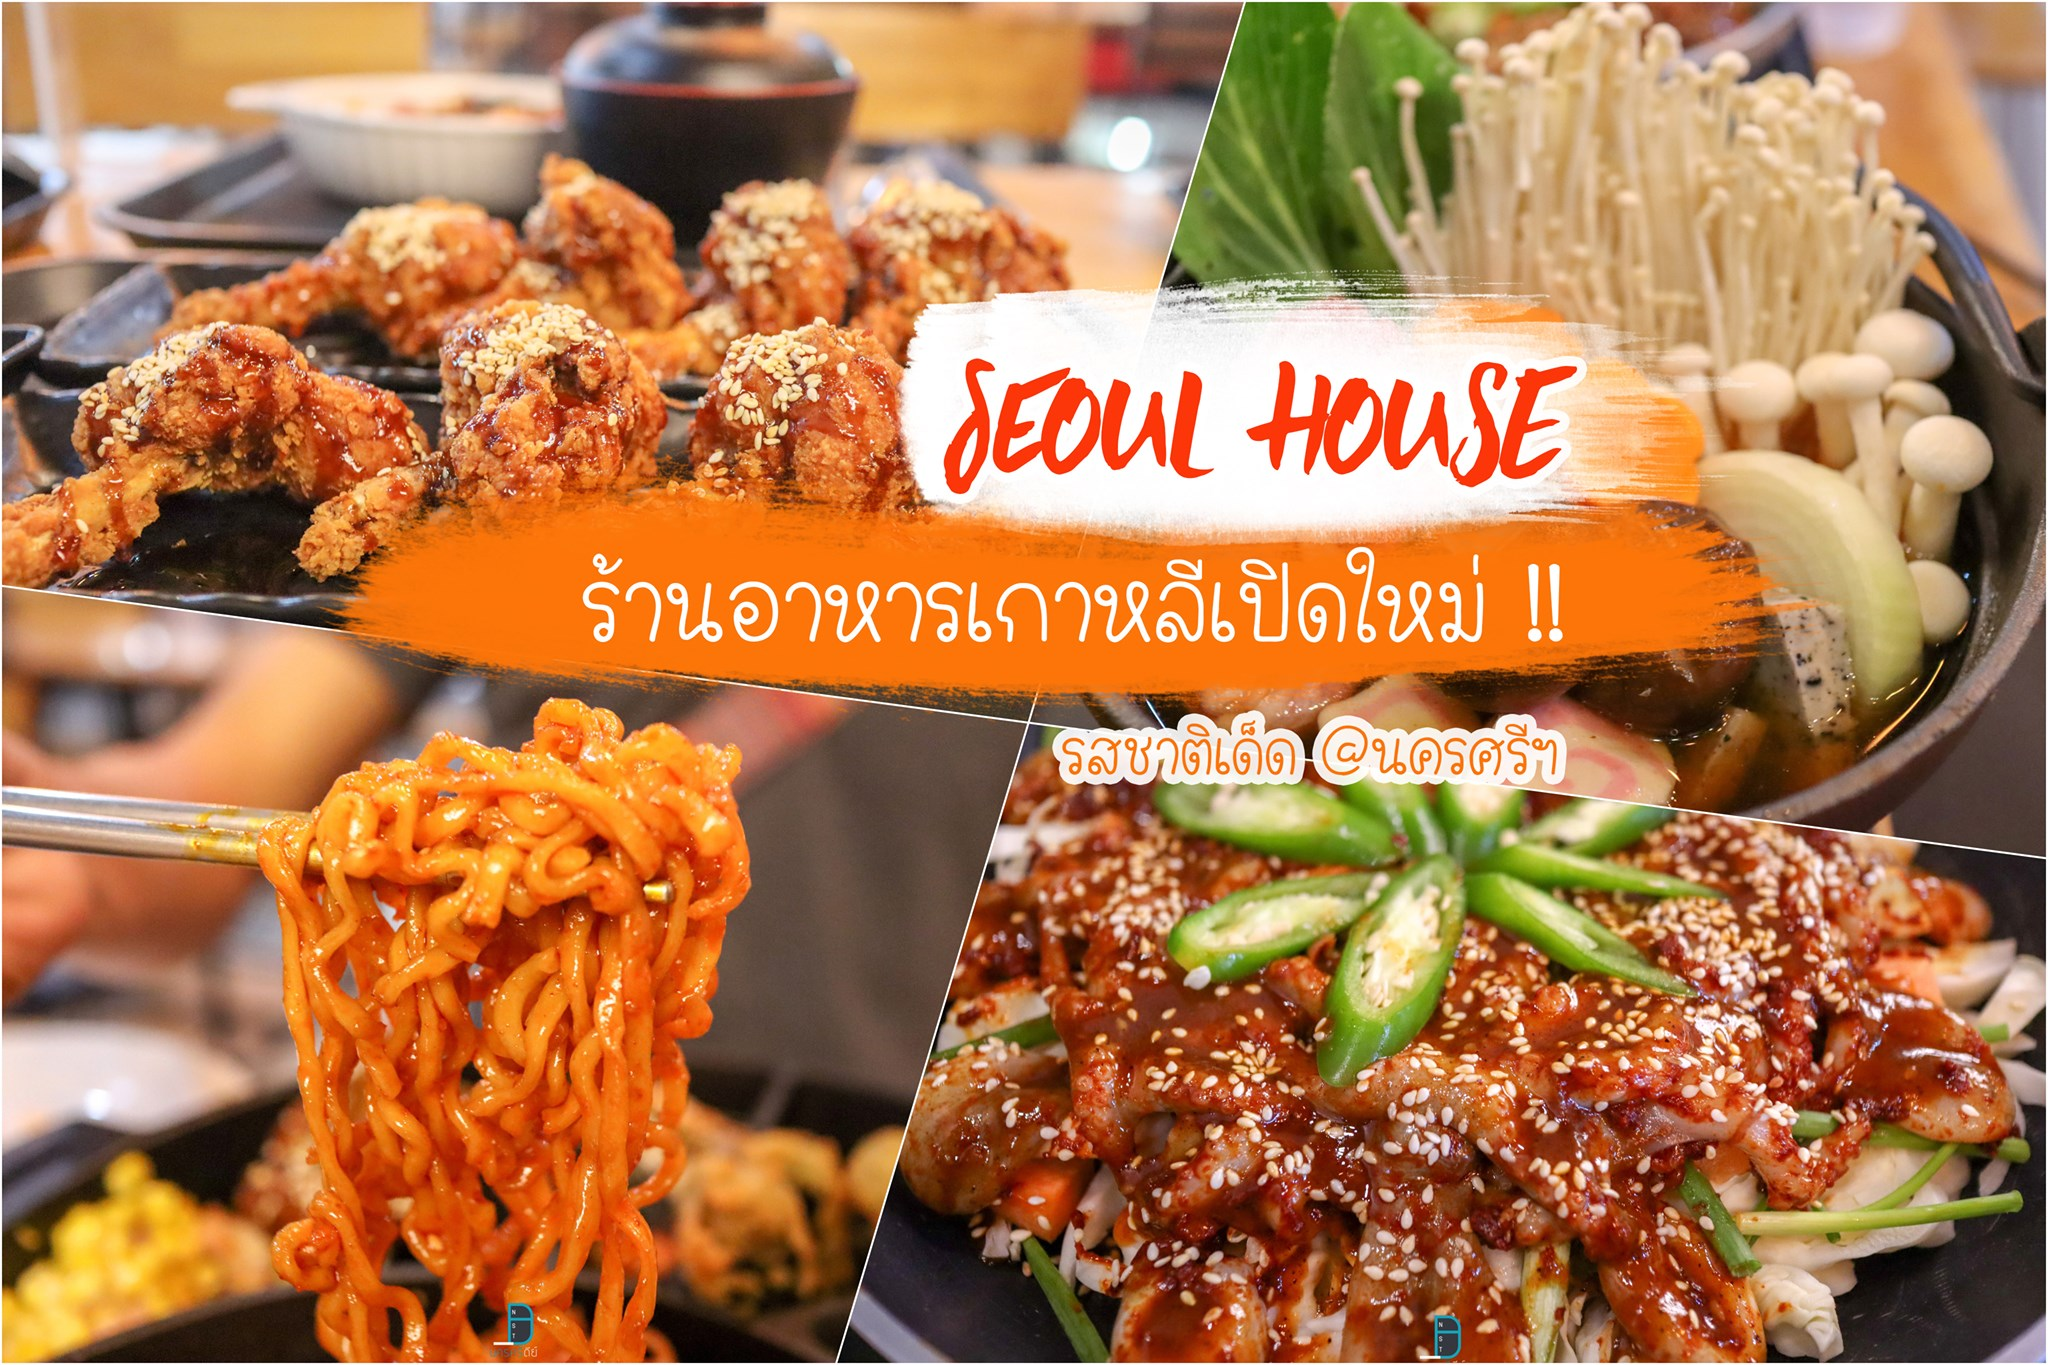 29.-Seoul-House-https://nakhonsidee.com/show/read/1/140  ส่วน-30---44-รับชมต่อได้ในเว็บไซต์-https://nakhonsidee.com/  checkin,nakhonsithammarat,ของกิน,ร้านอาหาร,จุดเช็คอิน,ที่เที่ยว